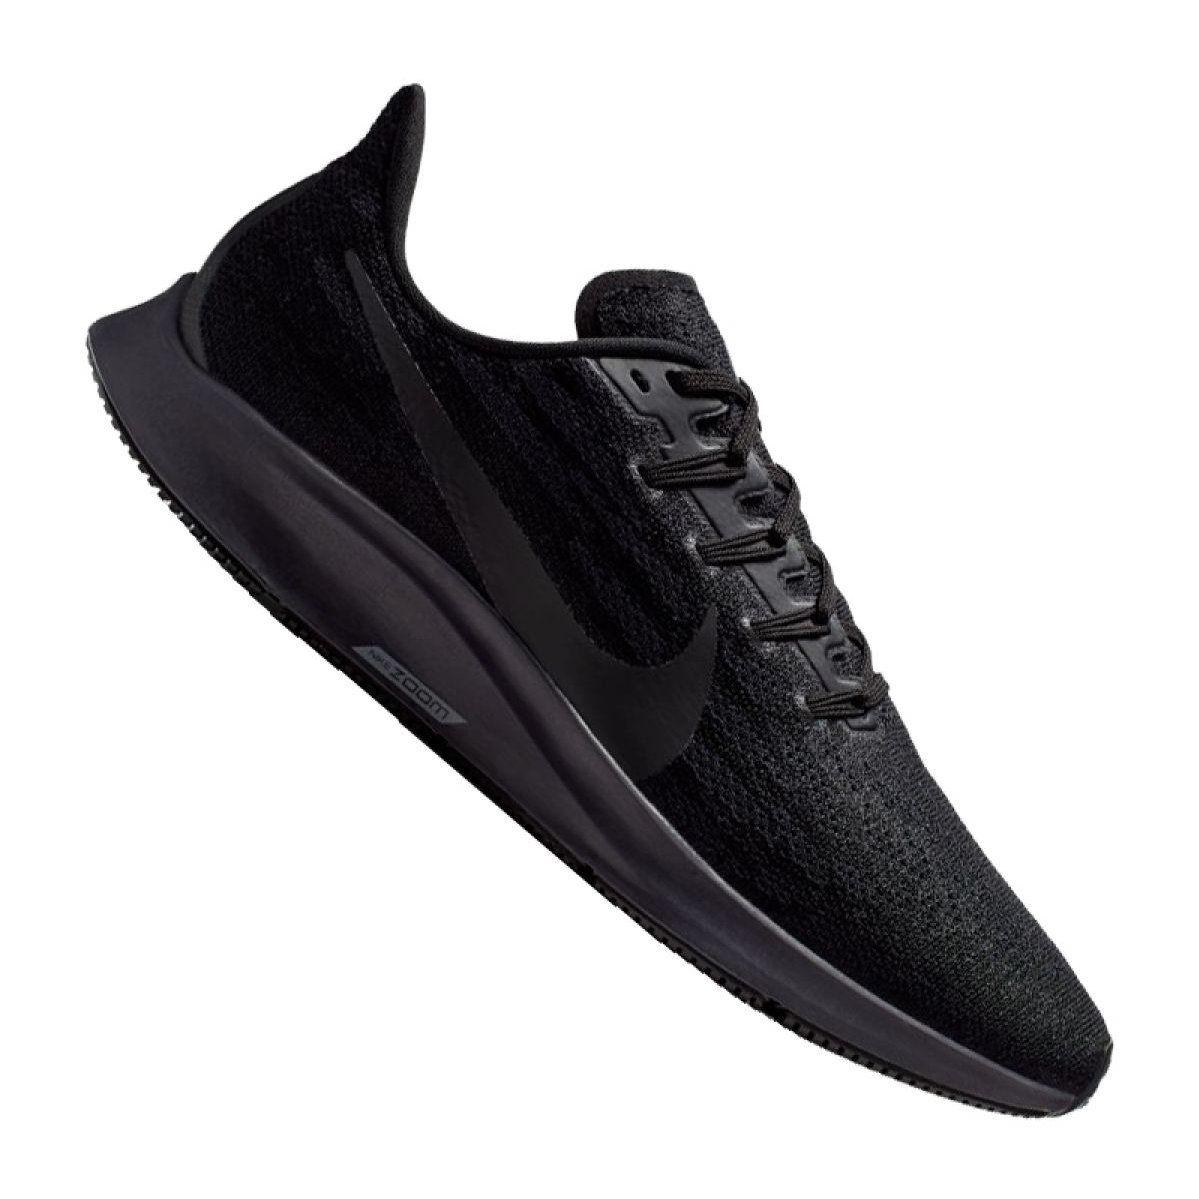 Buty Biegowe Nike Air Zoom Pegasus 36 M Aq2203 006 Czarne Running Shoes Nike Nike Air Zoom Pegasus Nike Air Zoom